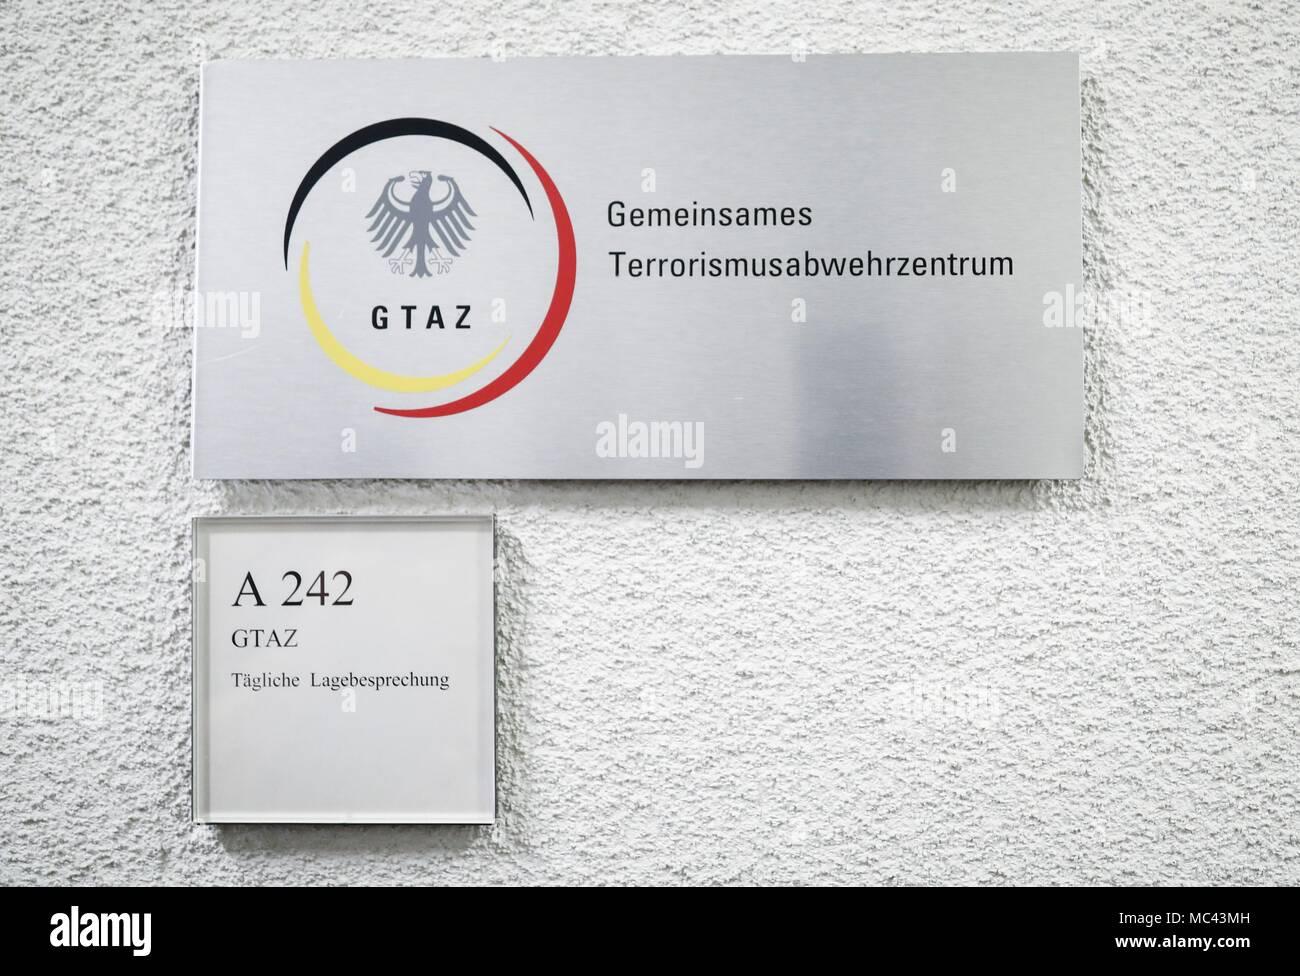 12 April 2018, Germany, Berlin: A sign at the Gemeinsames Terrorismusabwehrzentrum (lit. Joint Counter-Terrorism Centre). Photo: Kay Nietfeld/dpa Stock Photo